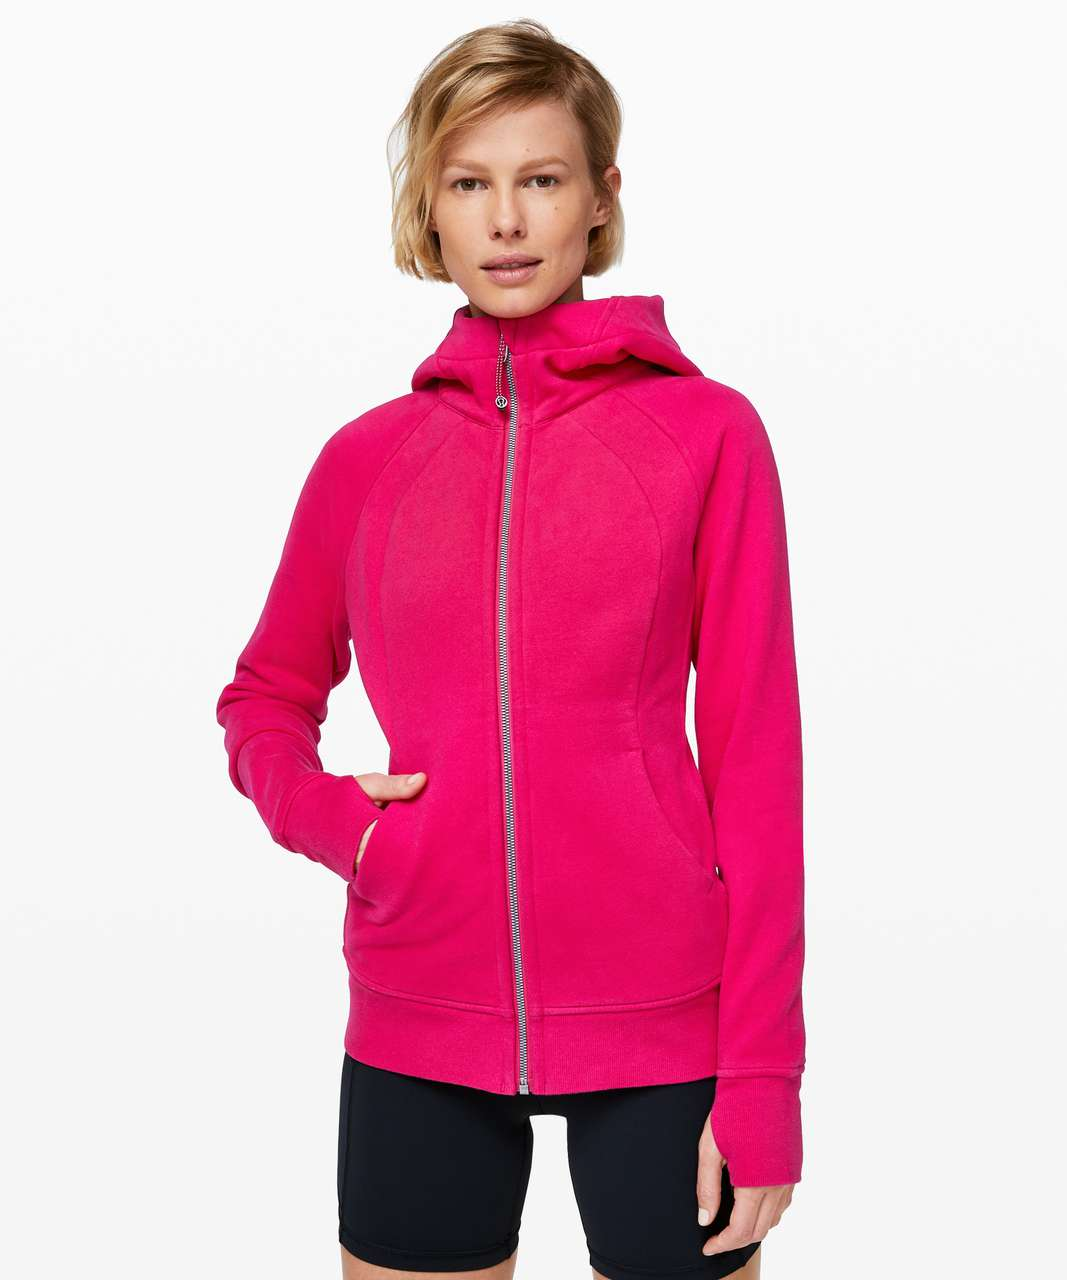 Lululemon Scuba Hoodie *Light Cotton Fleece - Calypso Pink